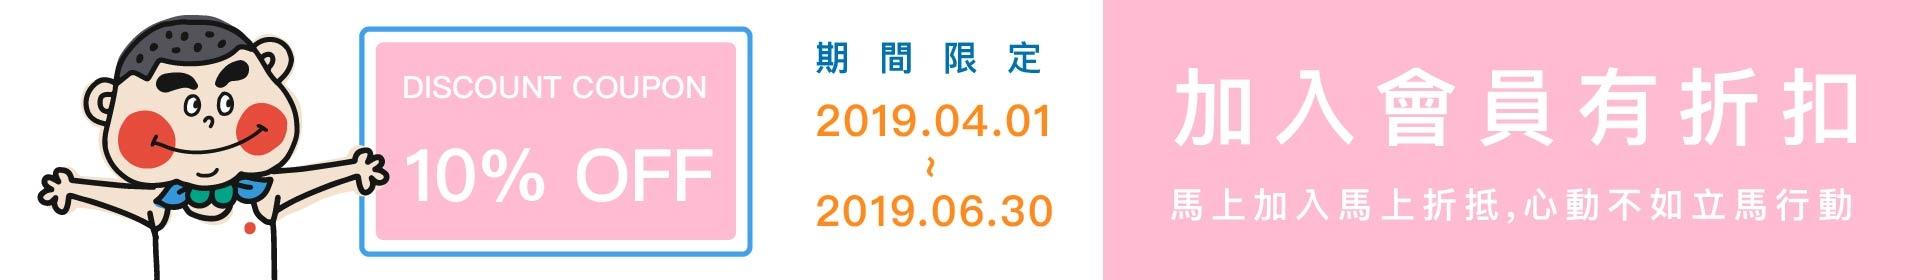 加入茚YinTaiwan會員優惠